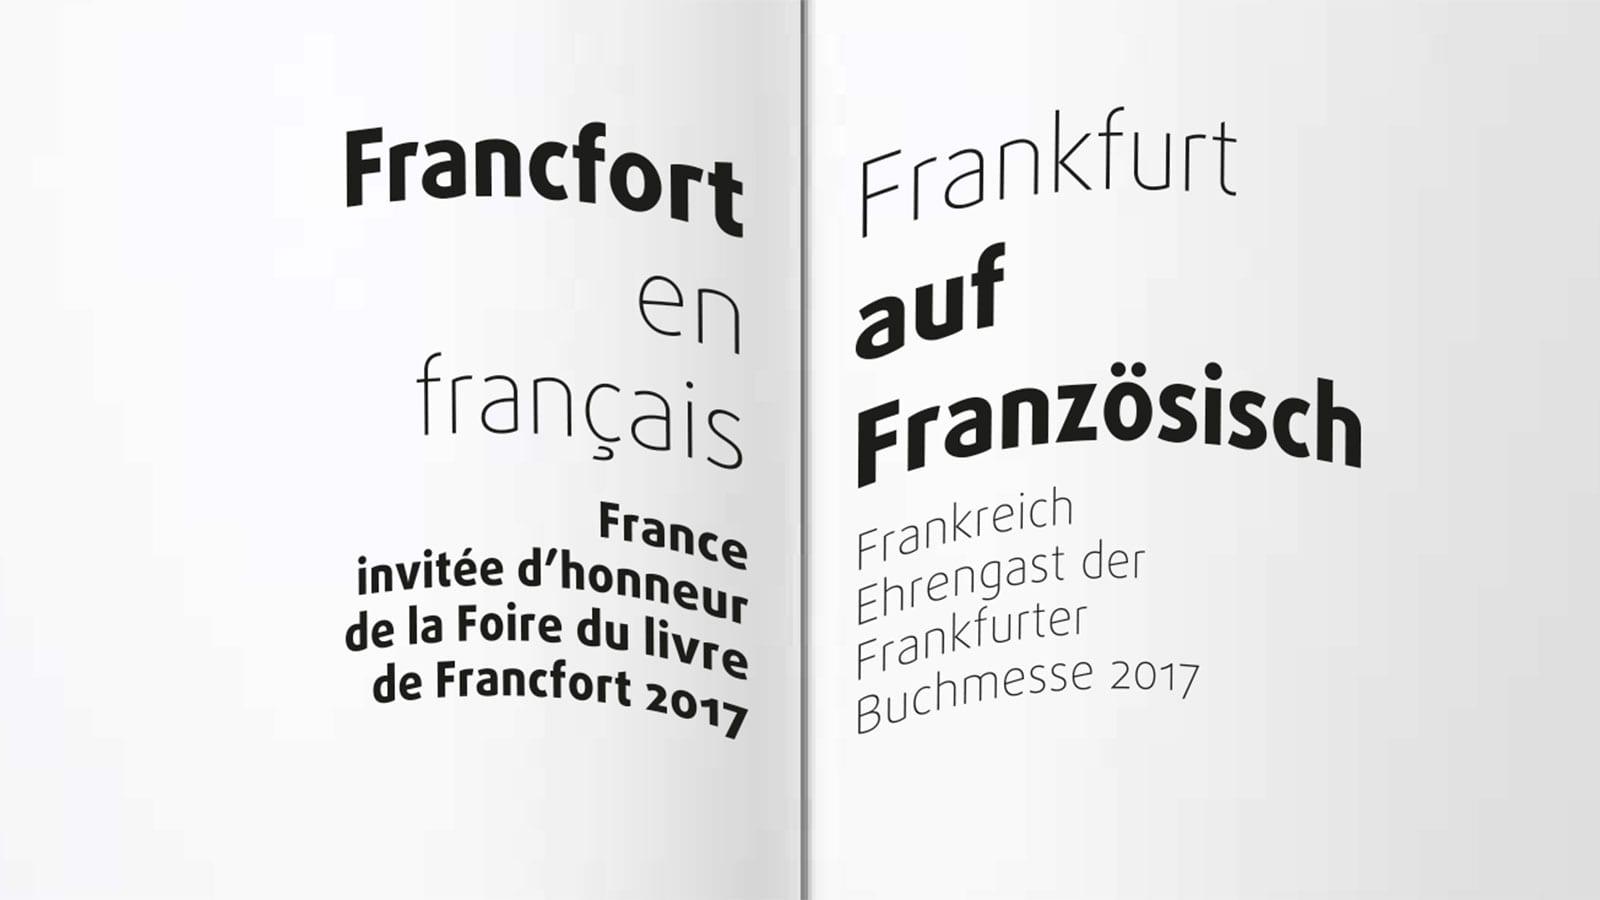 Francfort en français